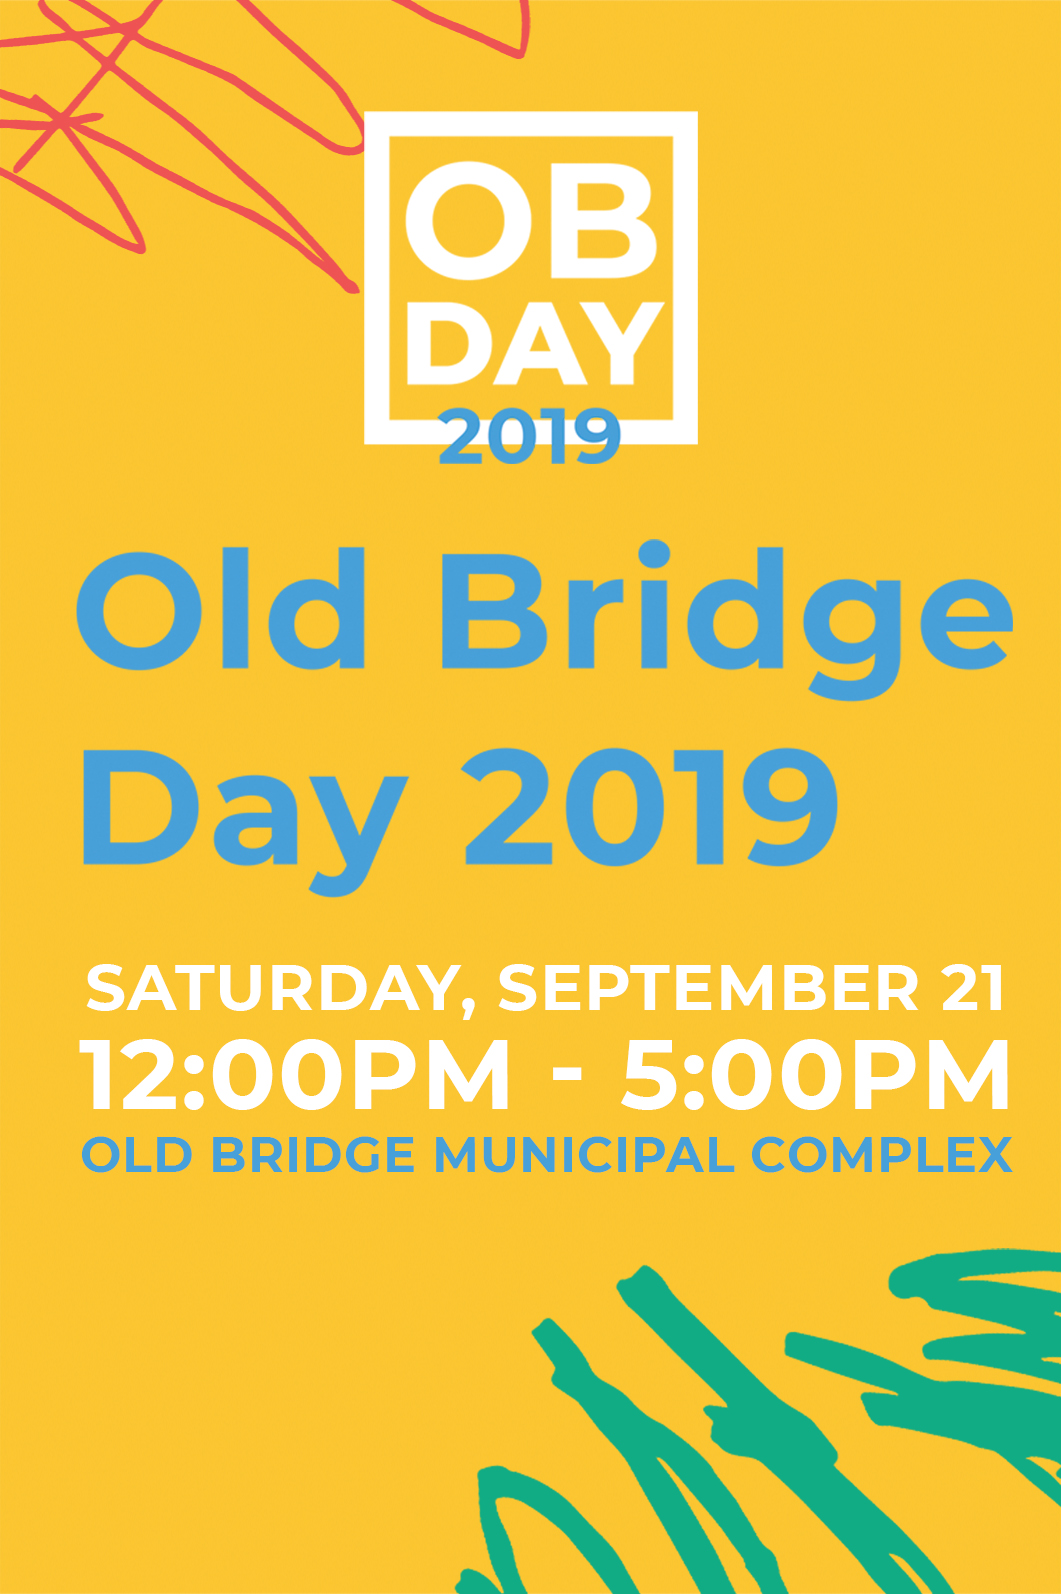 Church_Old Bridge Day 2019 (4).jpg